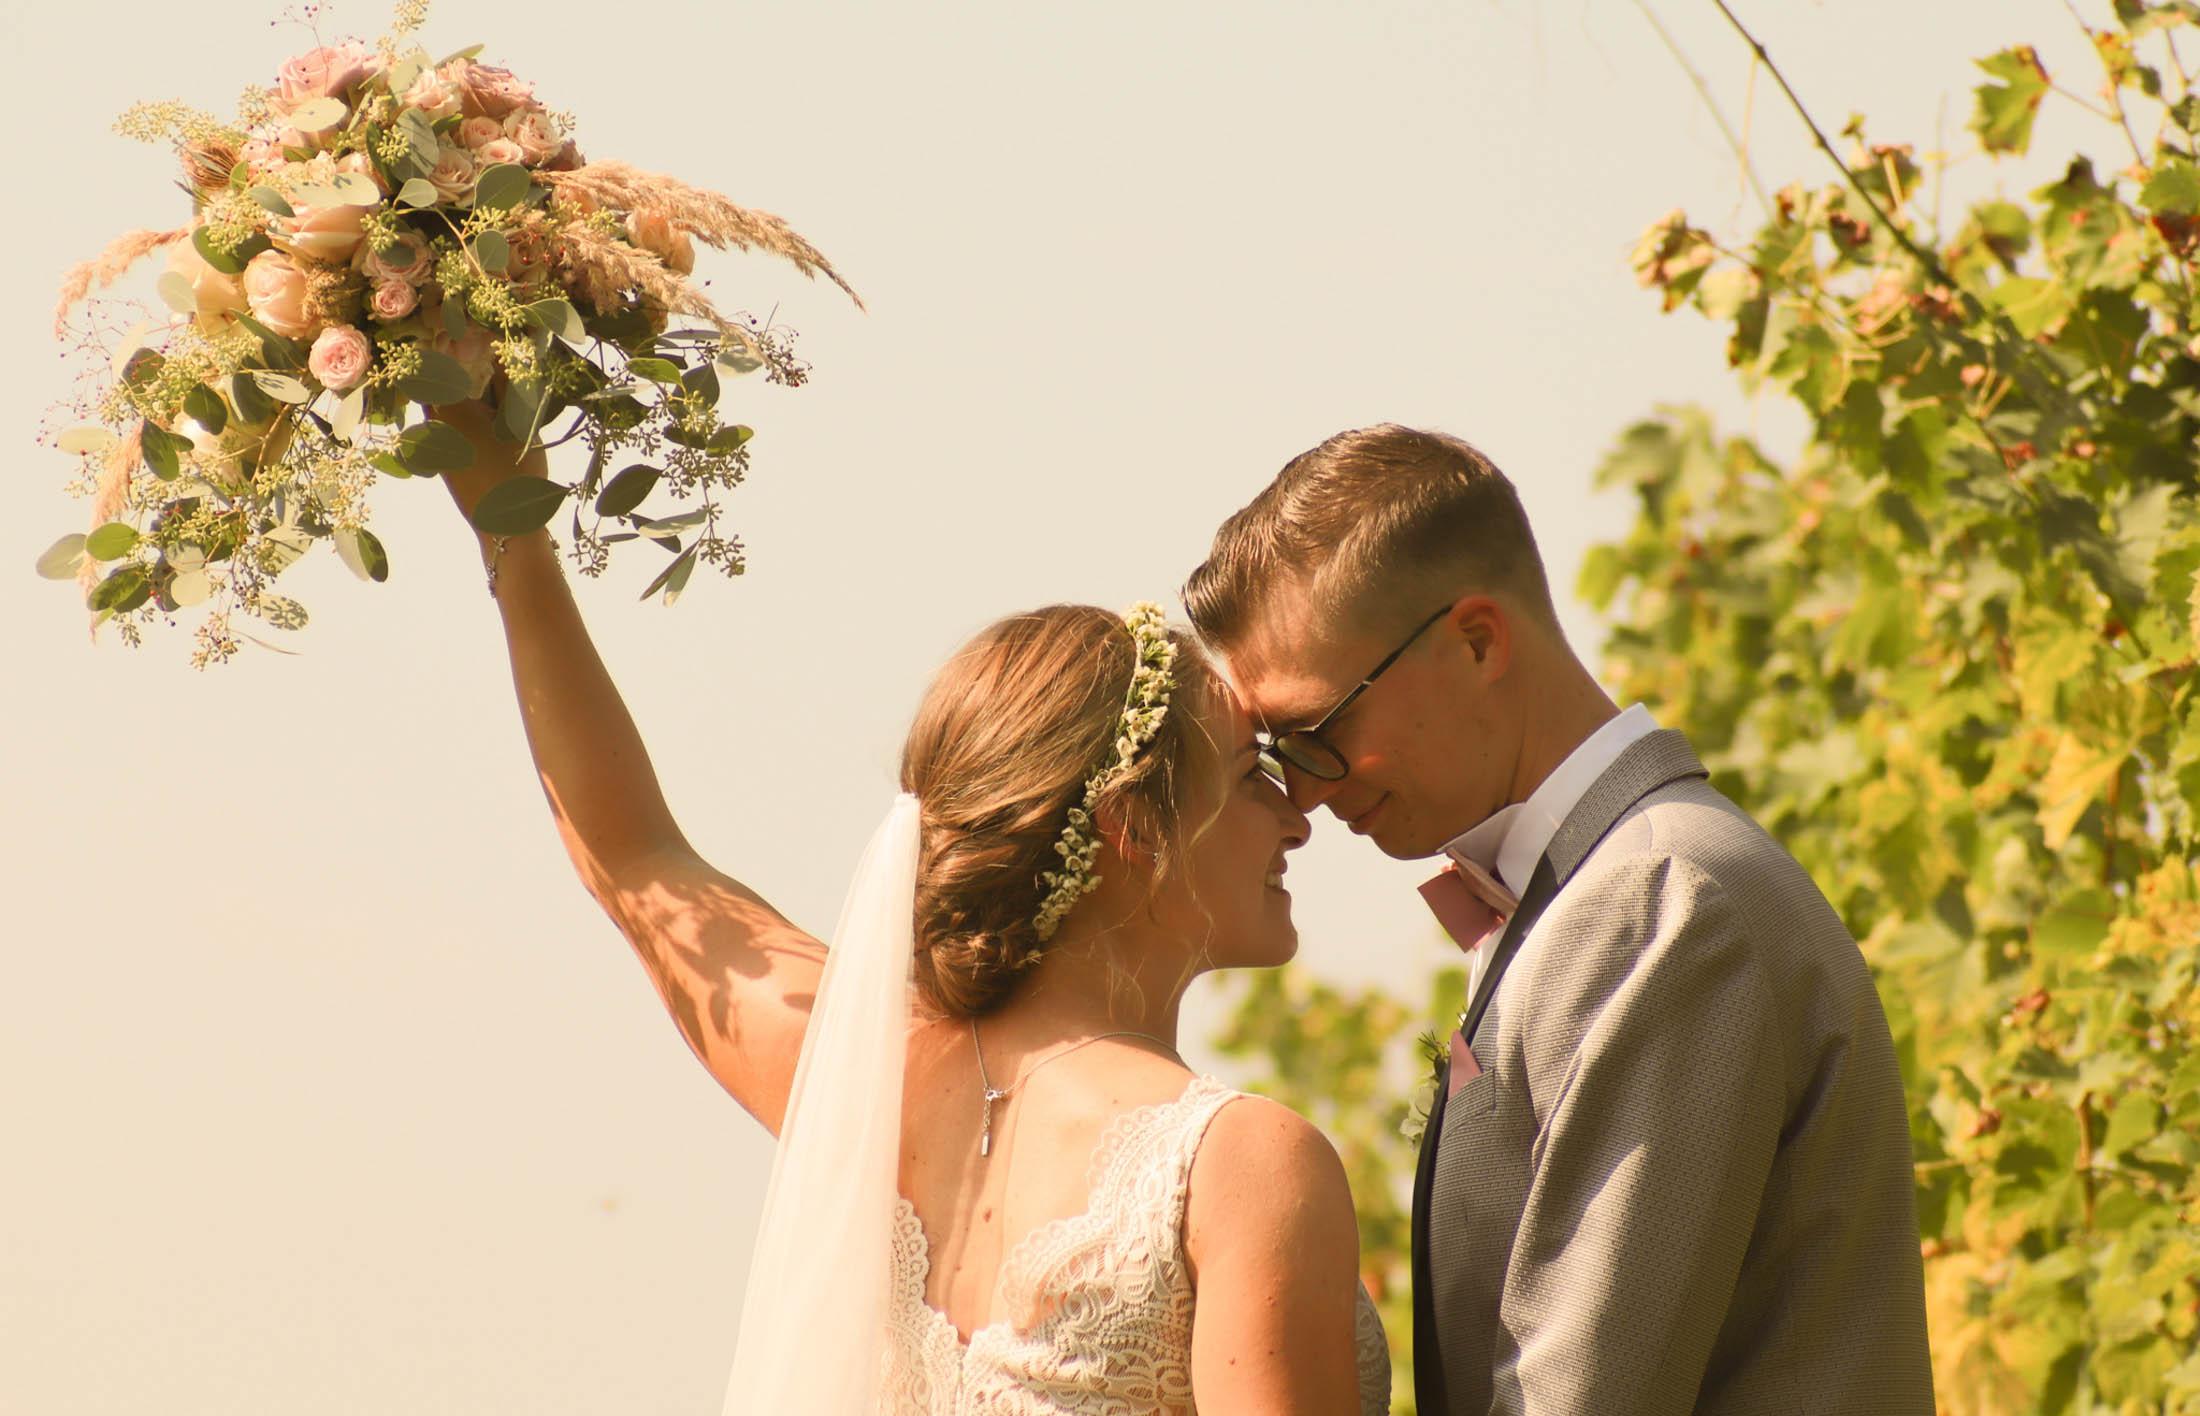 Hochzeitsfotografin Raphaela Bozic